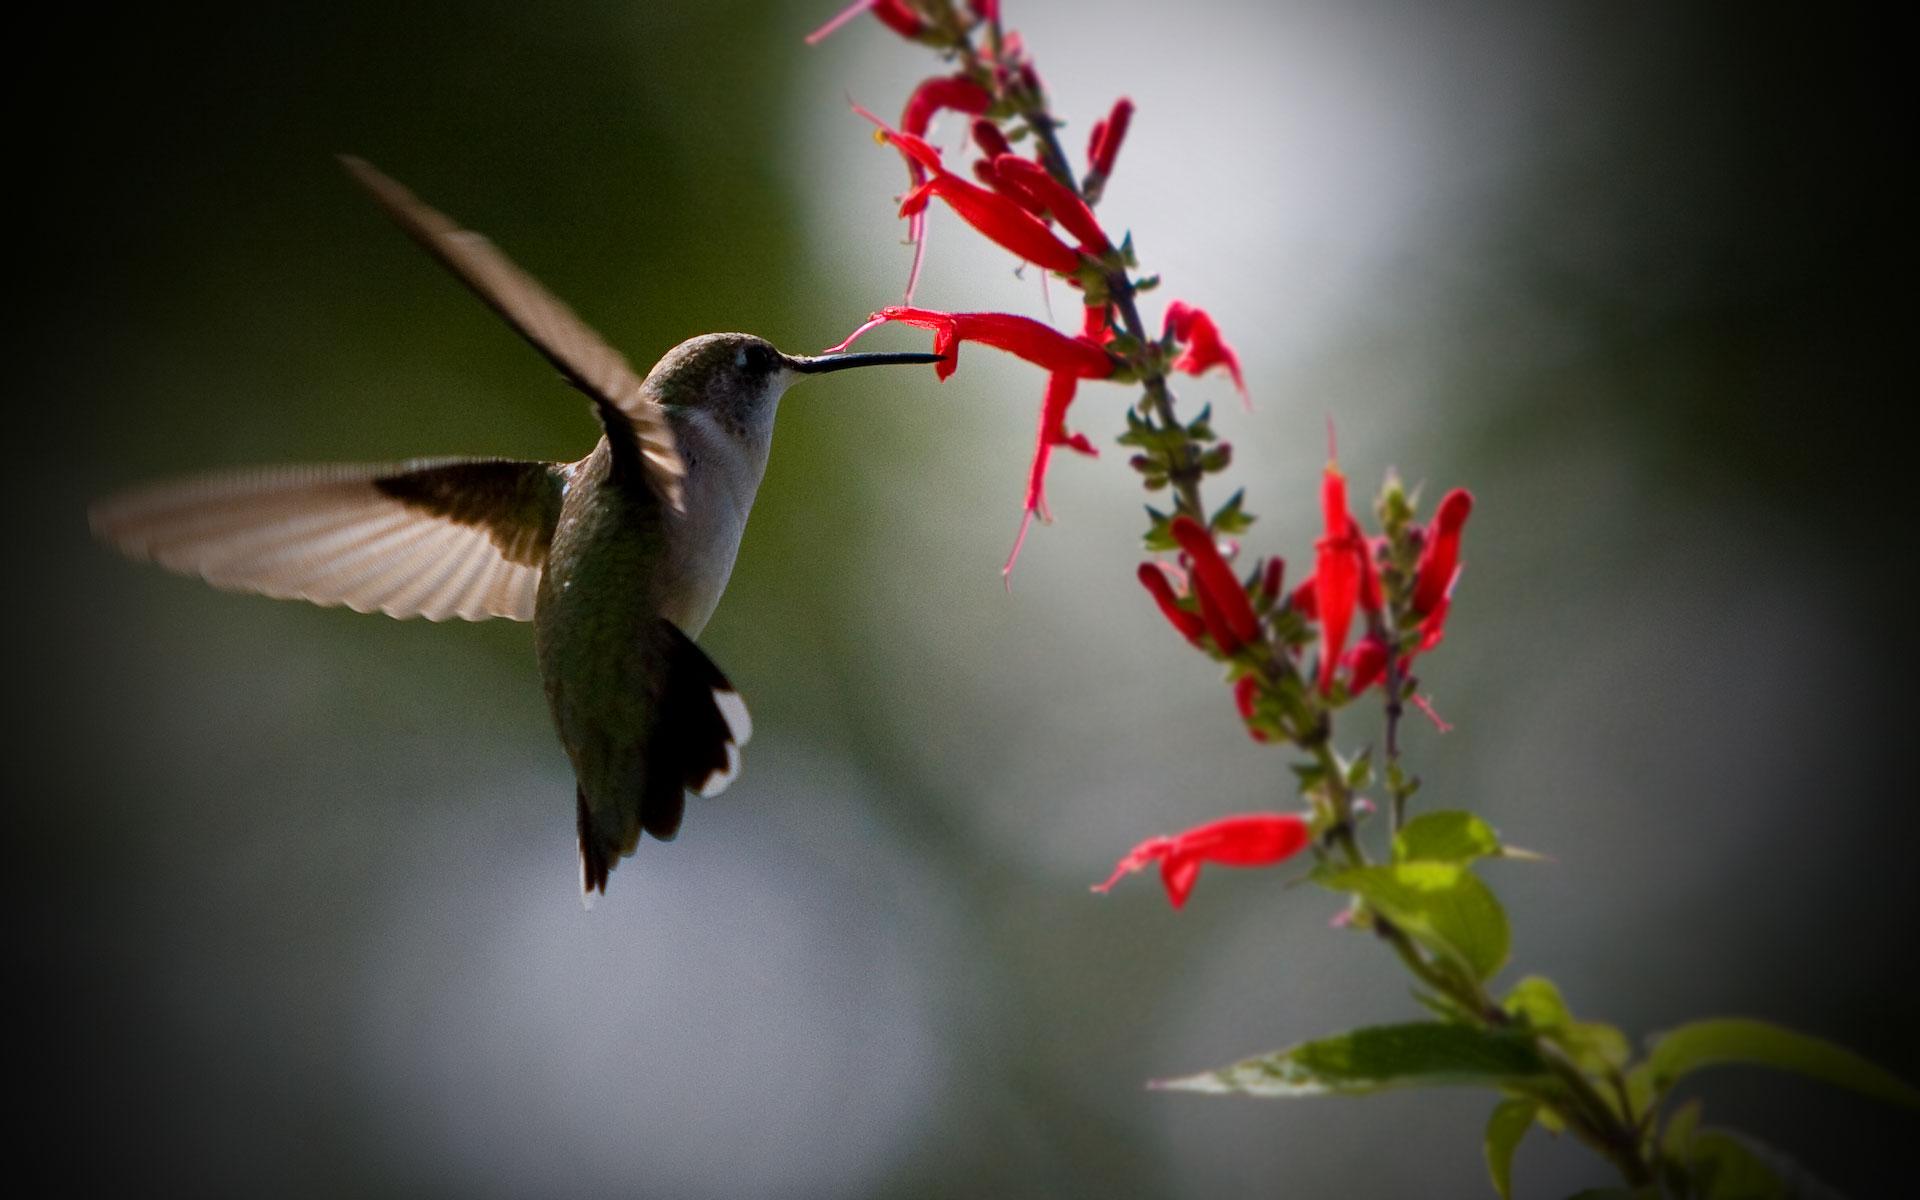 hummingbird screensaver and backgrounds